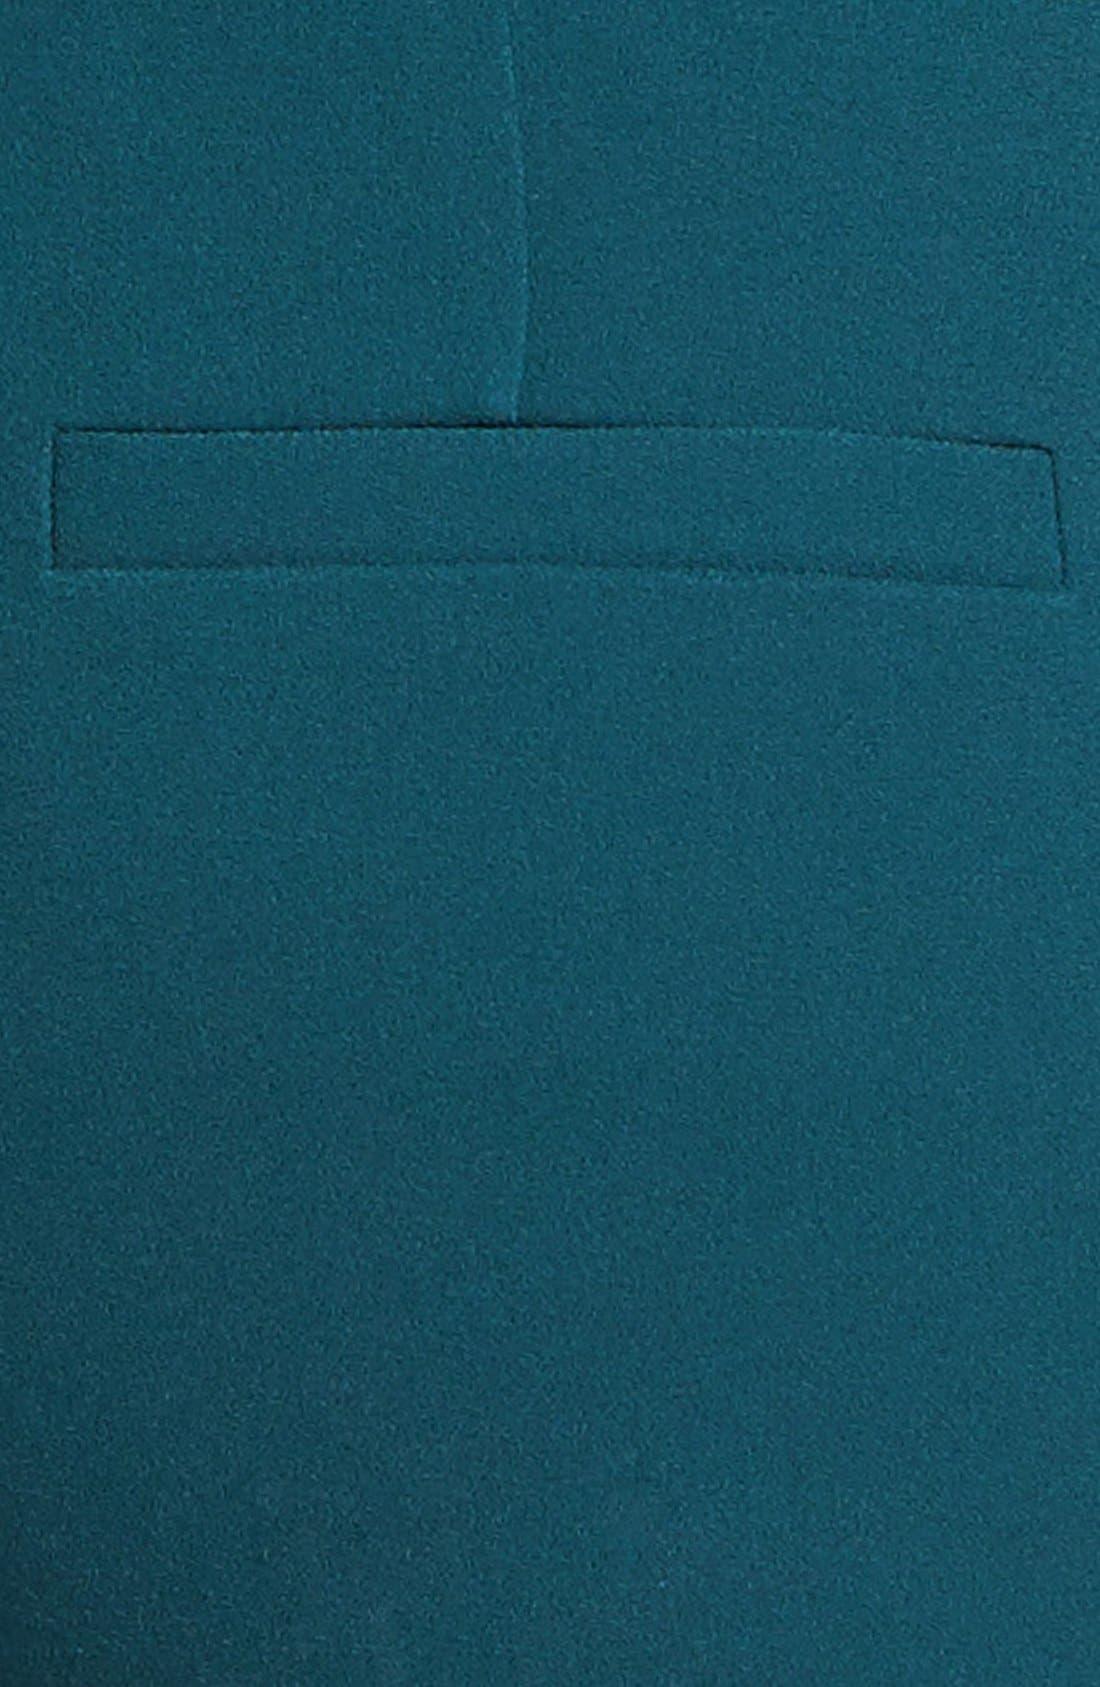 Alternate Image 3  - MARC BY MARC JACOBS 'Sparks' Crepe Pants